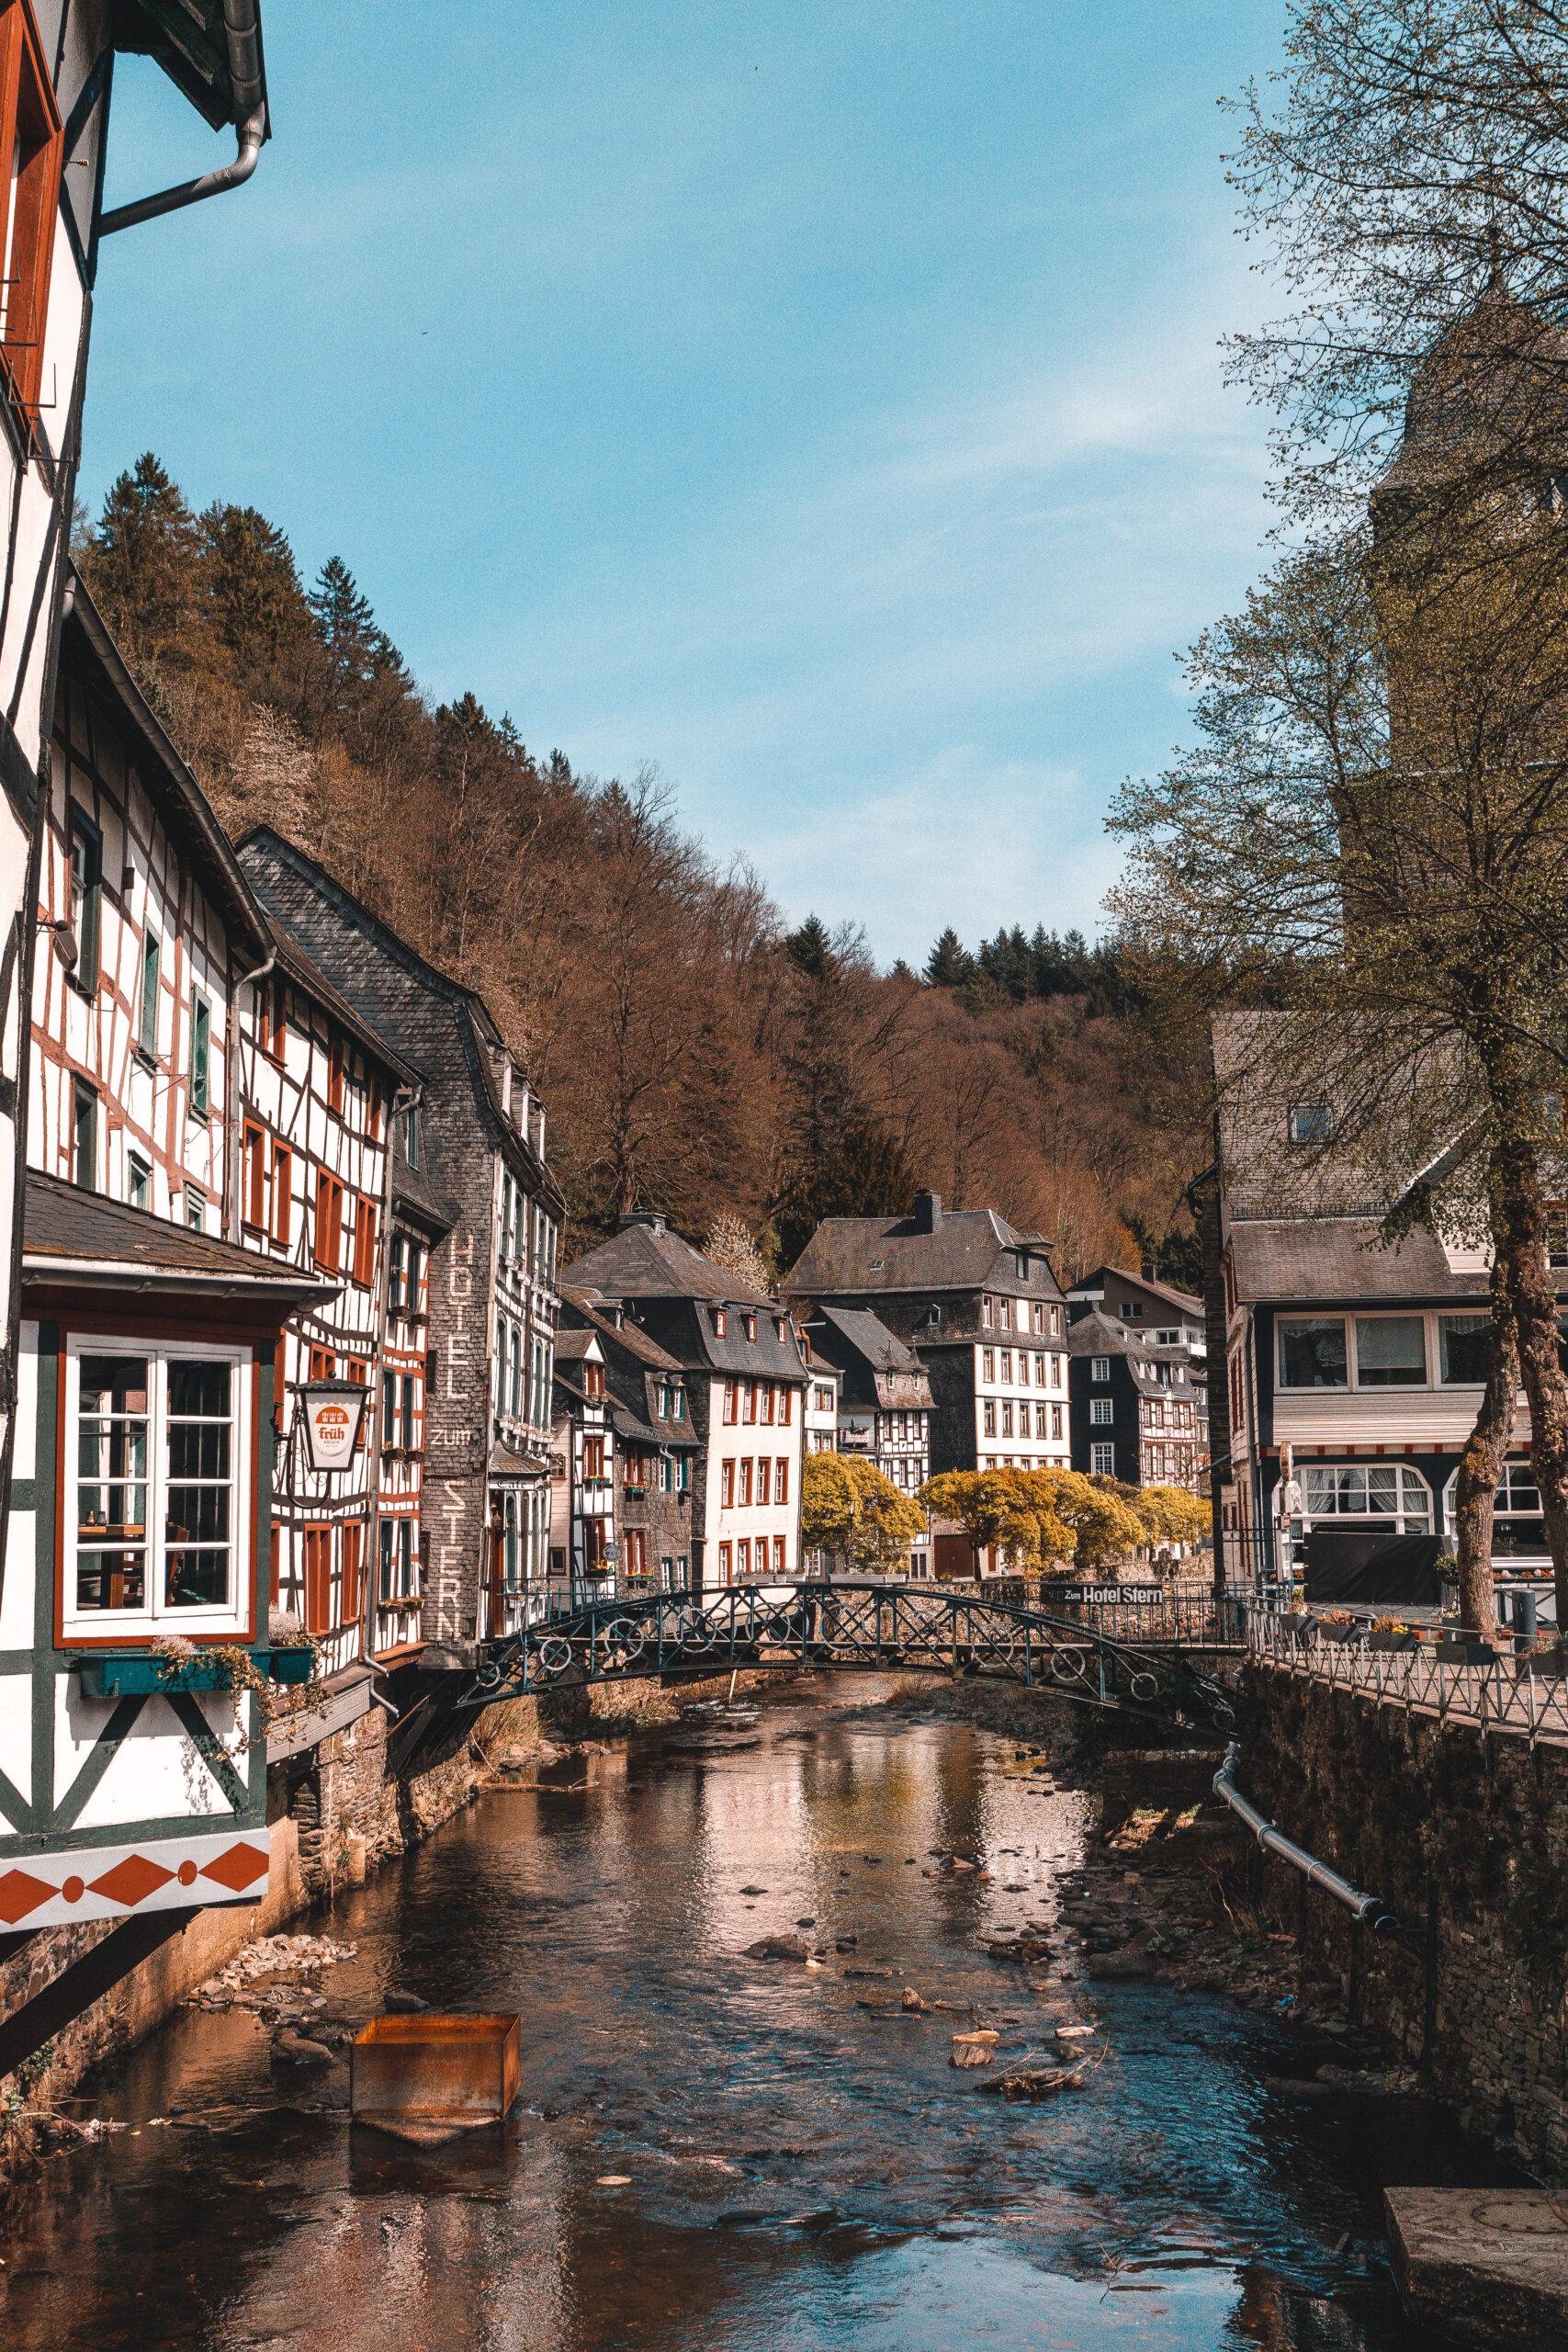 Monschau Germany | Travel Guide